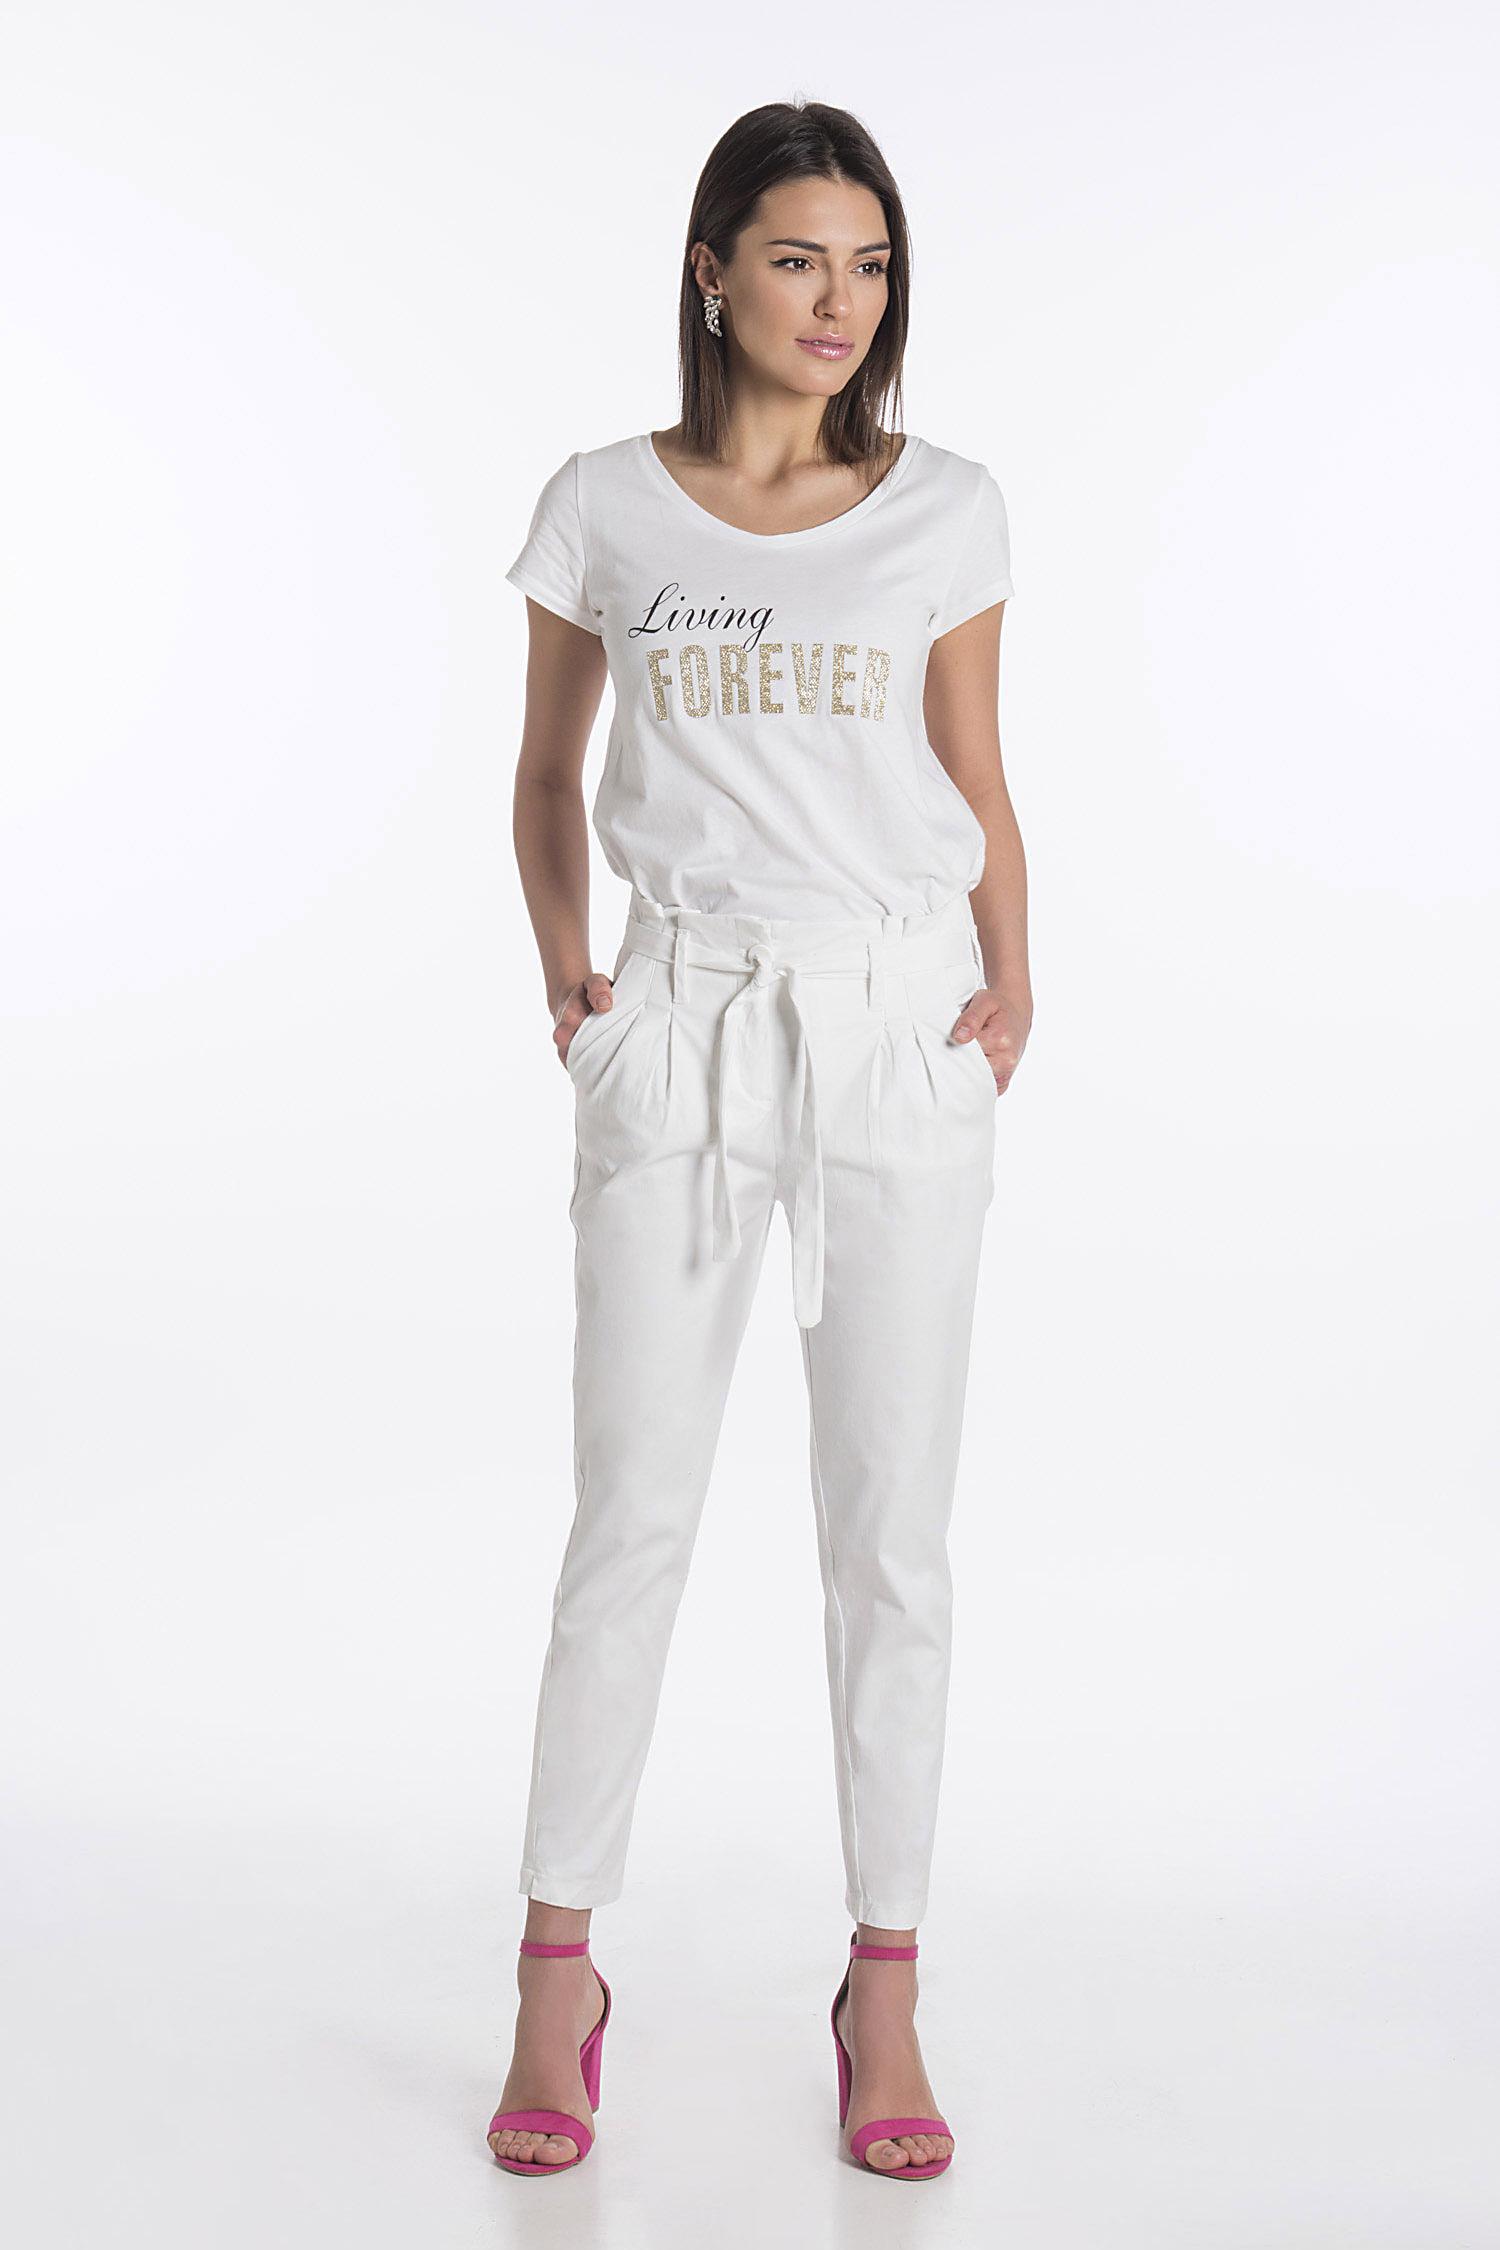 e1508d61cf8b Μονόχρωμο Υφασμάτινο Παντελόνι Με Τσέπες   Ζώνη ONLINE - ONLINE -  SP19ON-33322 ...